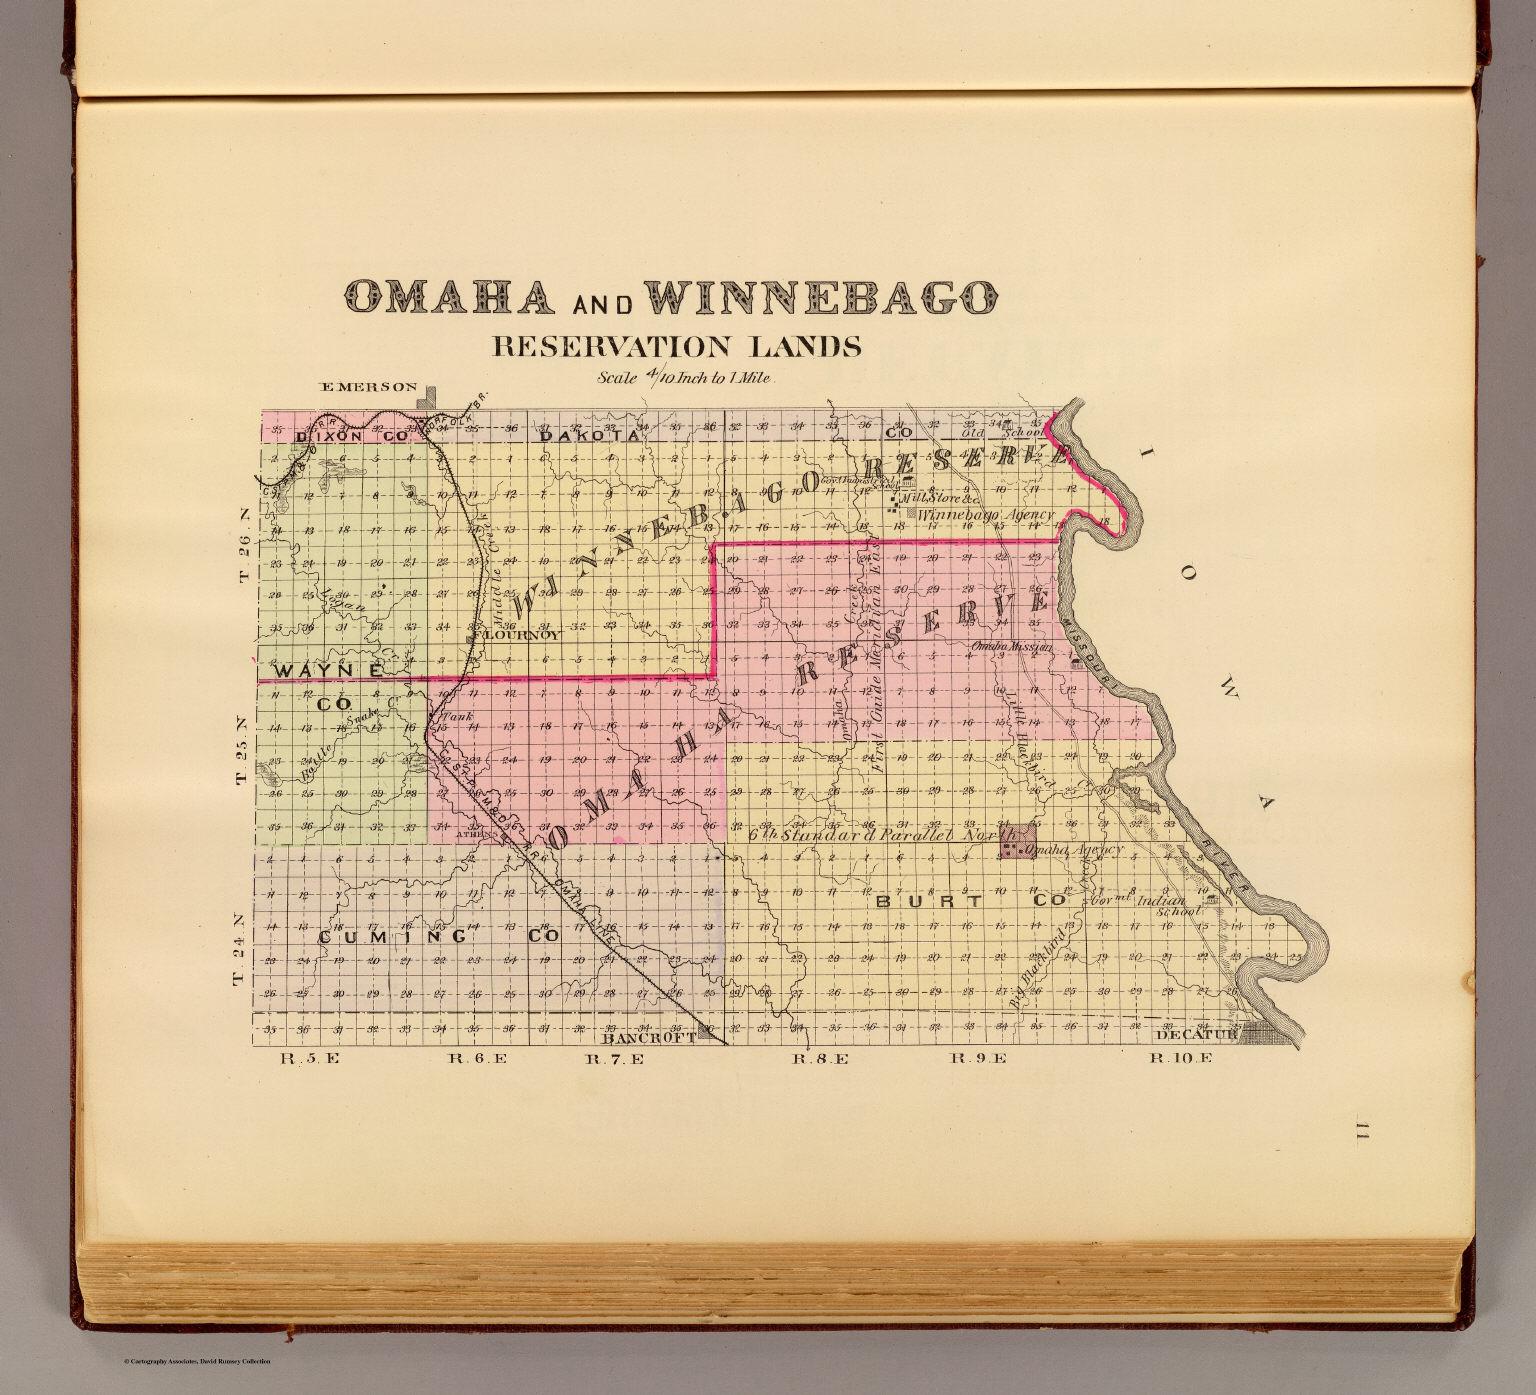 omaha winnebago reservation lands